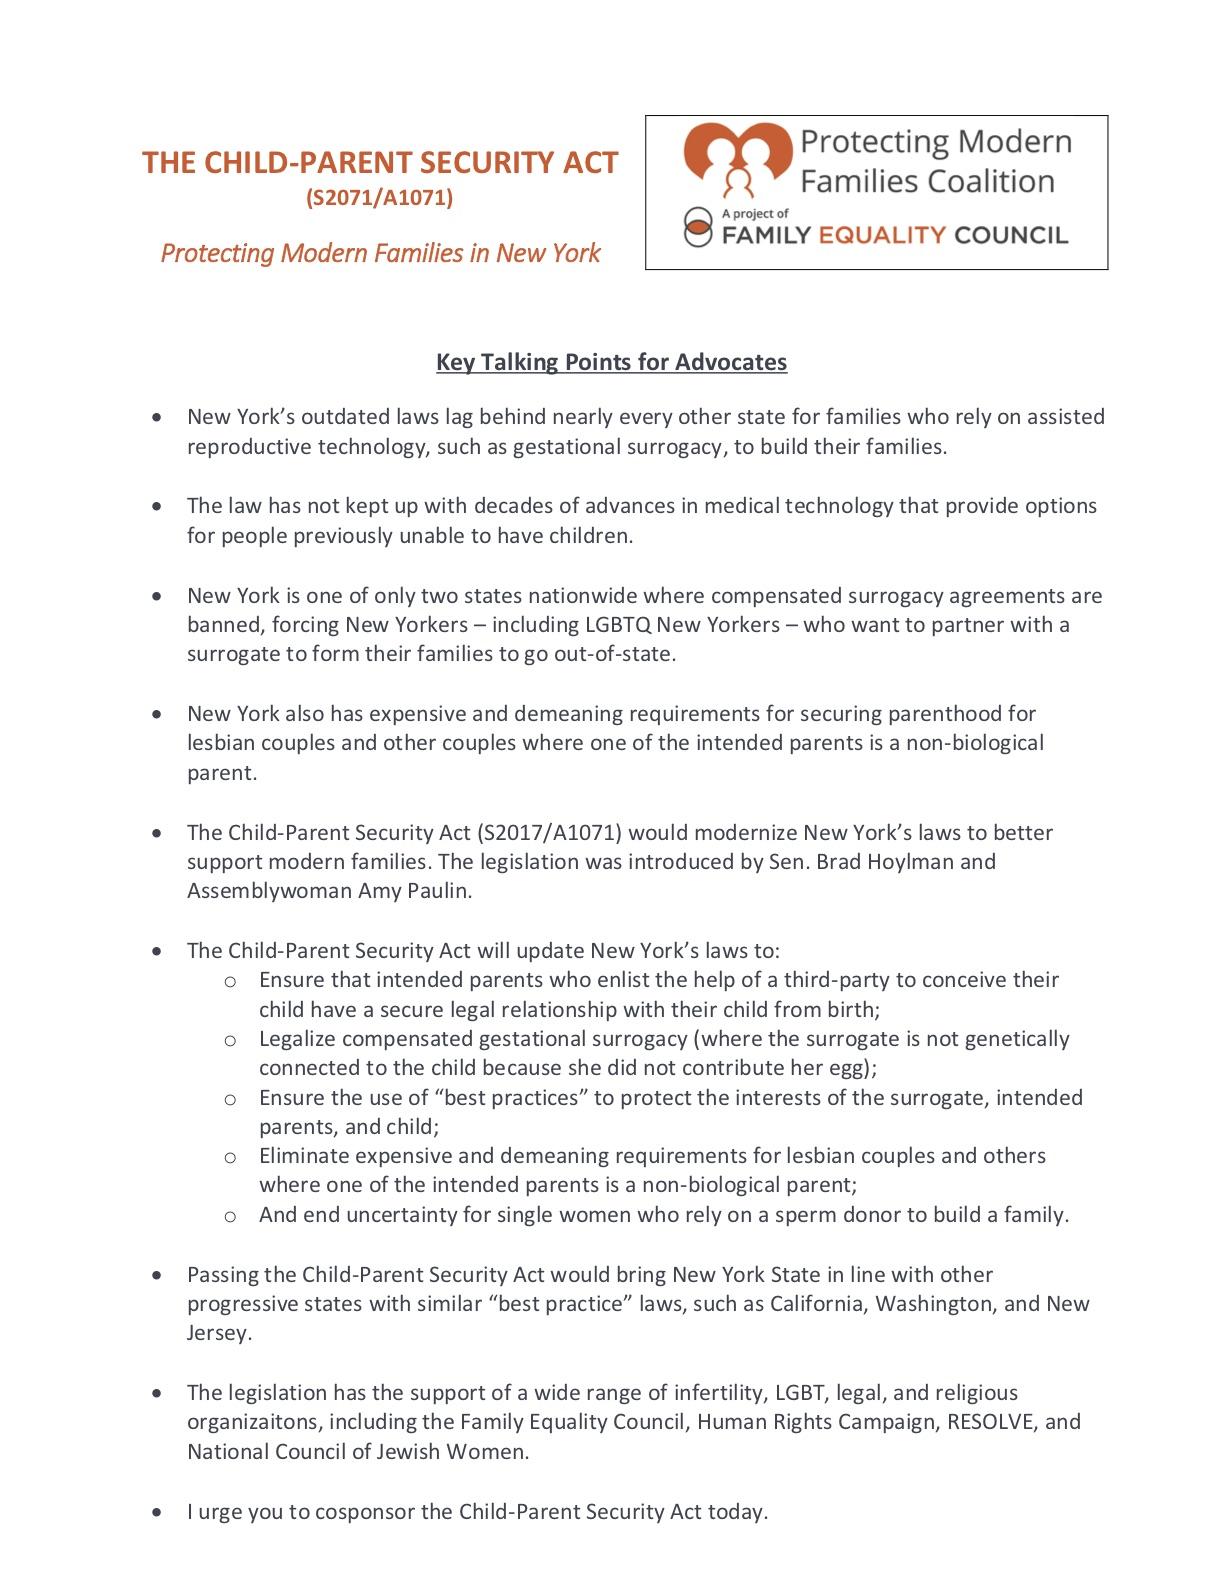 CPSA TPs for Advocates_COVER.jpg